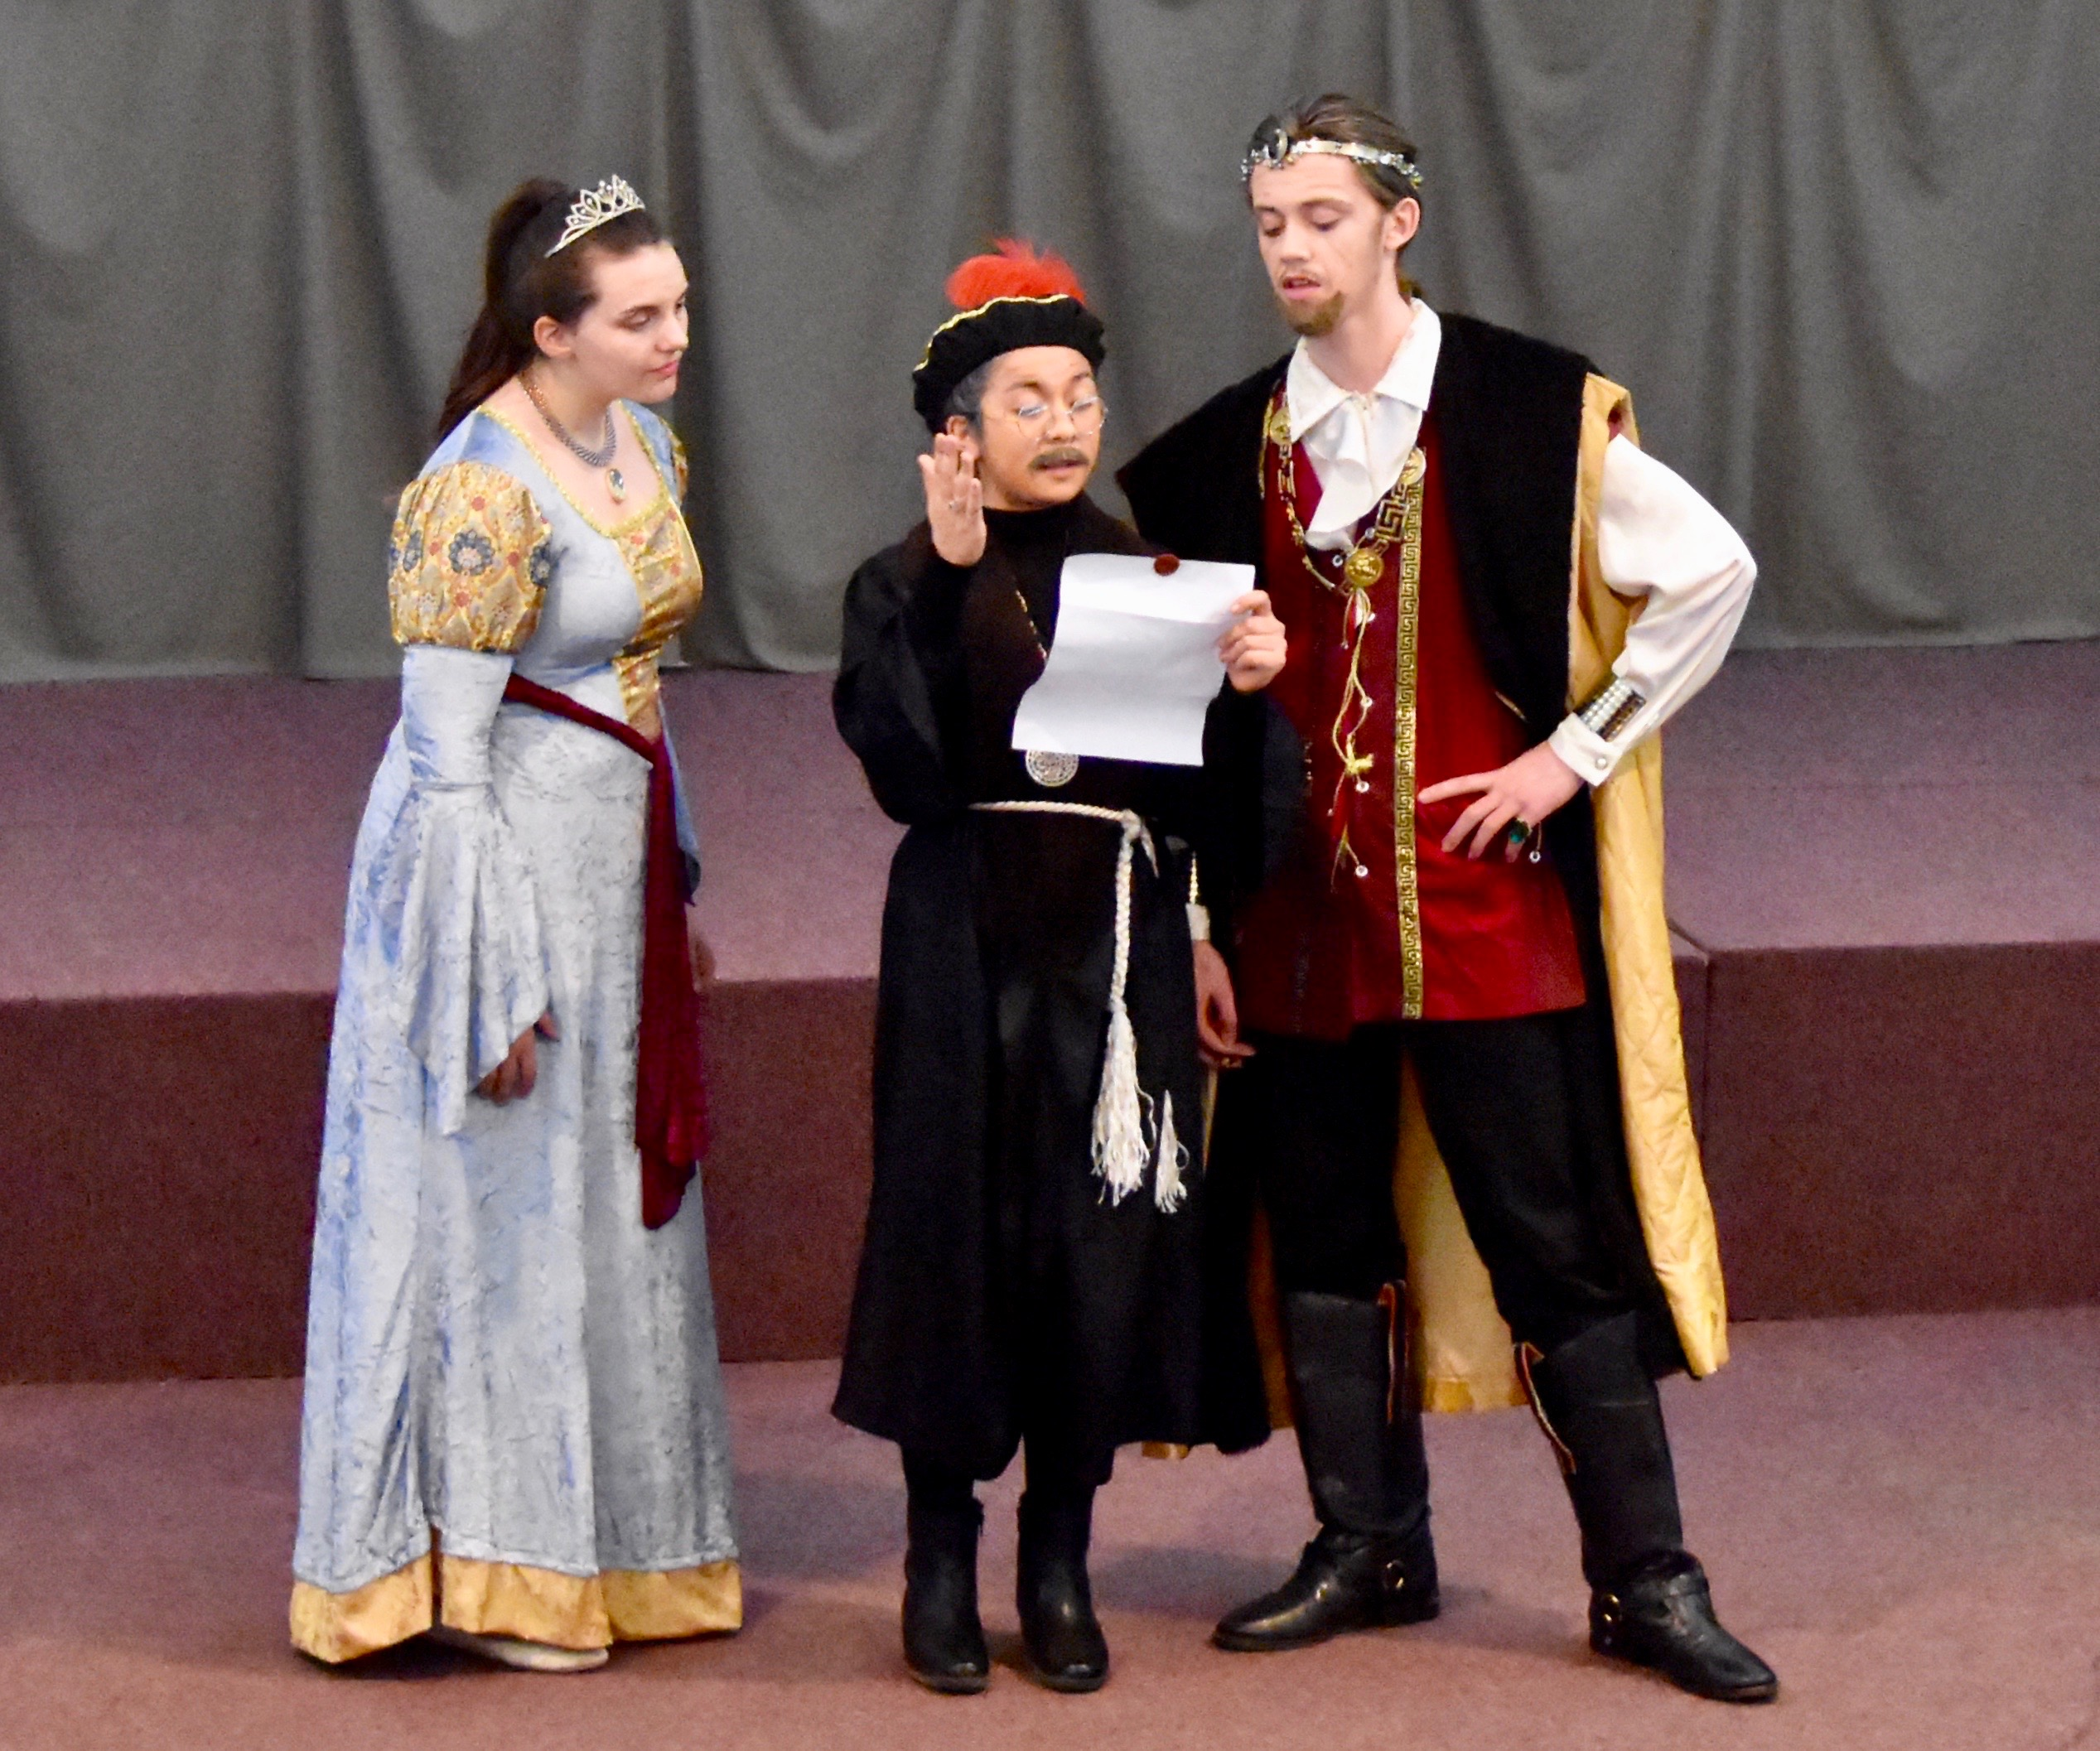 Polonius expostulates